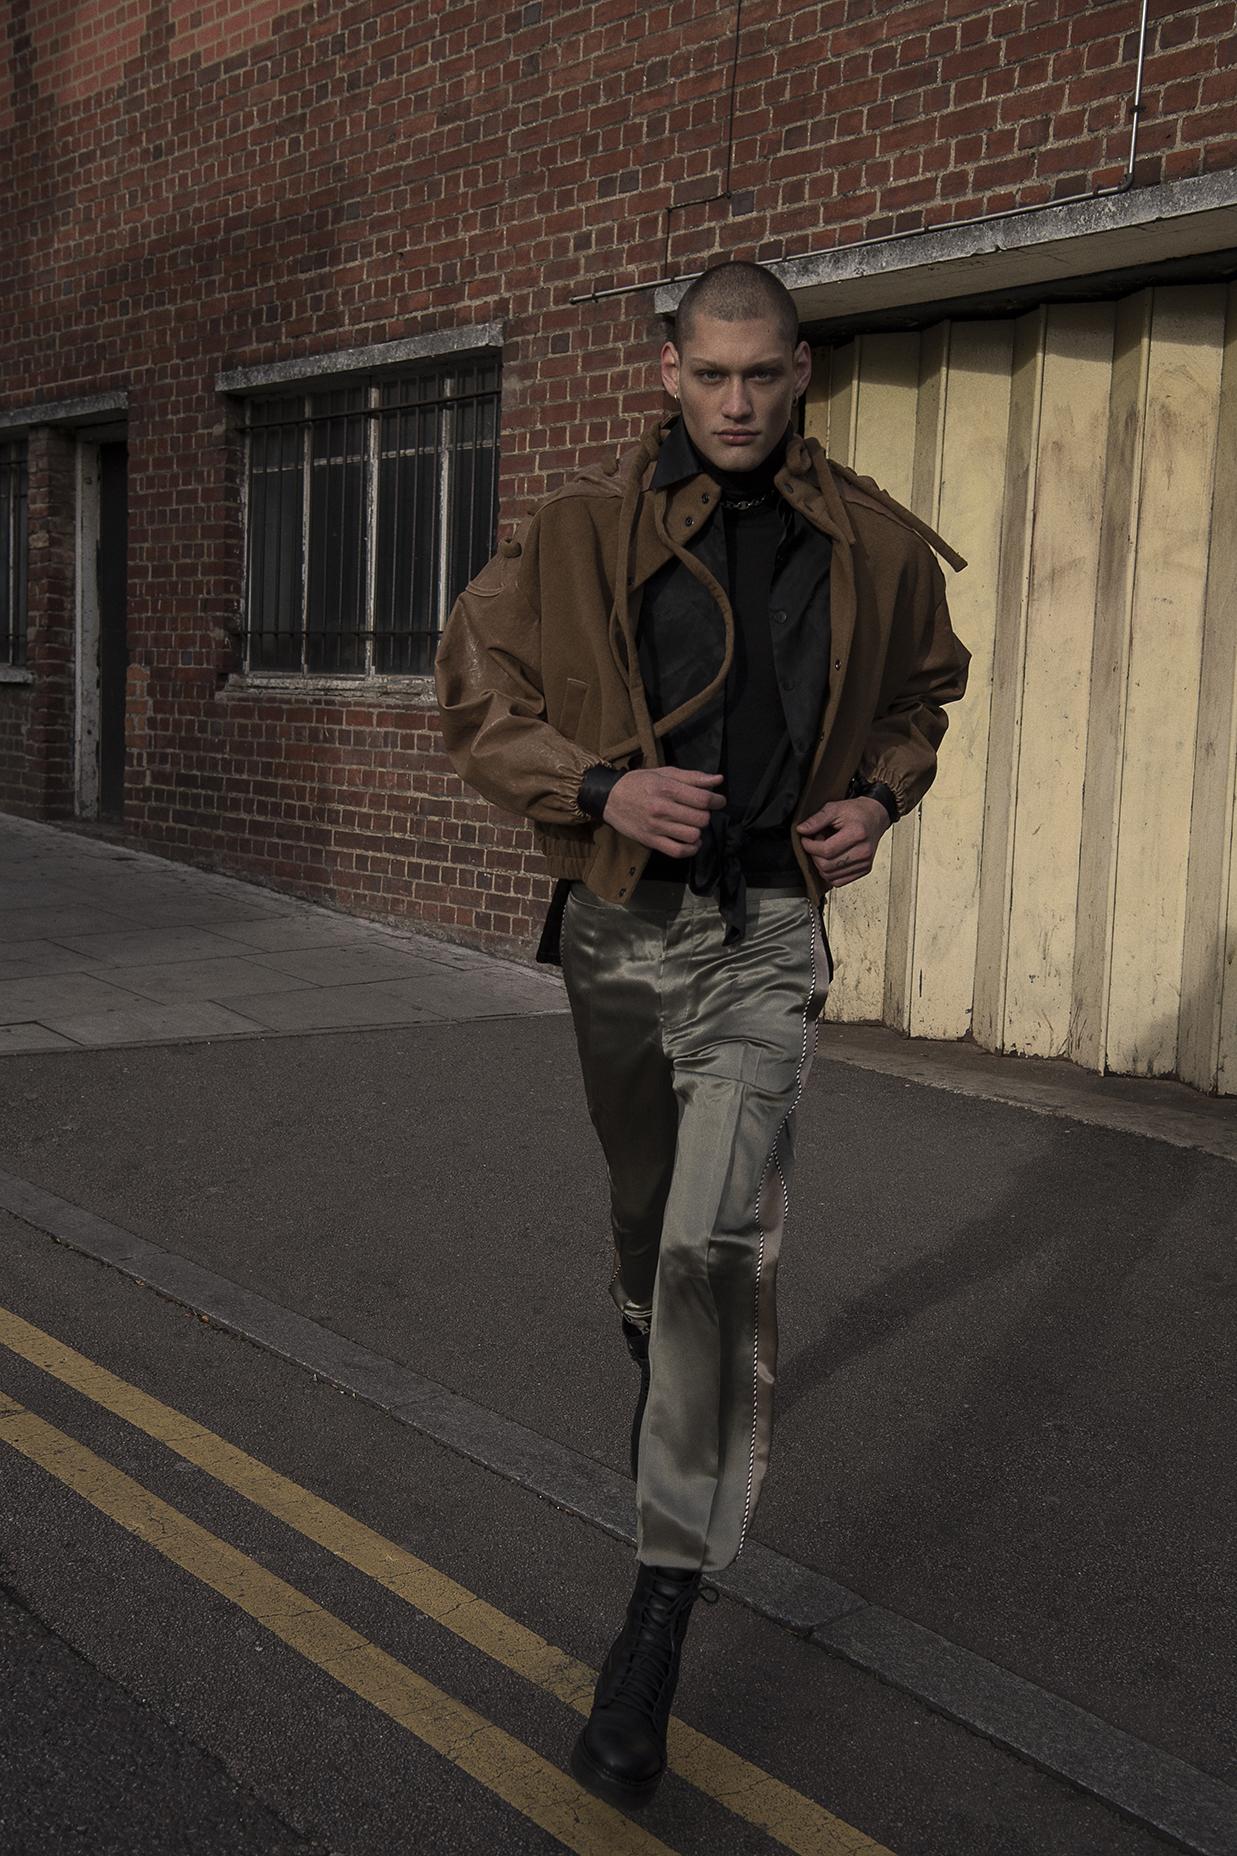 rollneck  jil sander  shirt  stylist's own  jacket  priya ahluwalia  trousers  louis vuitton shoes model's own